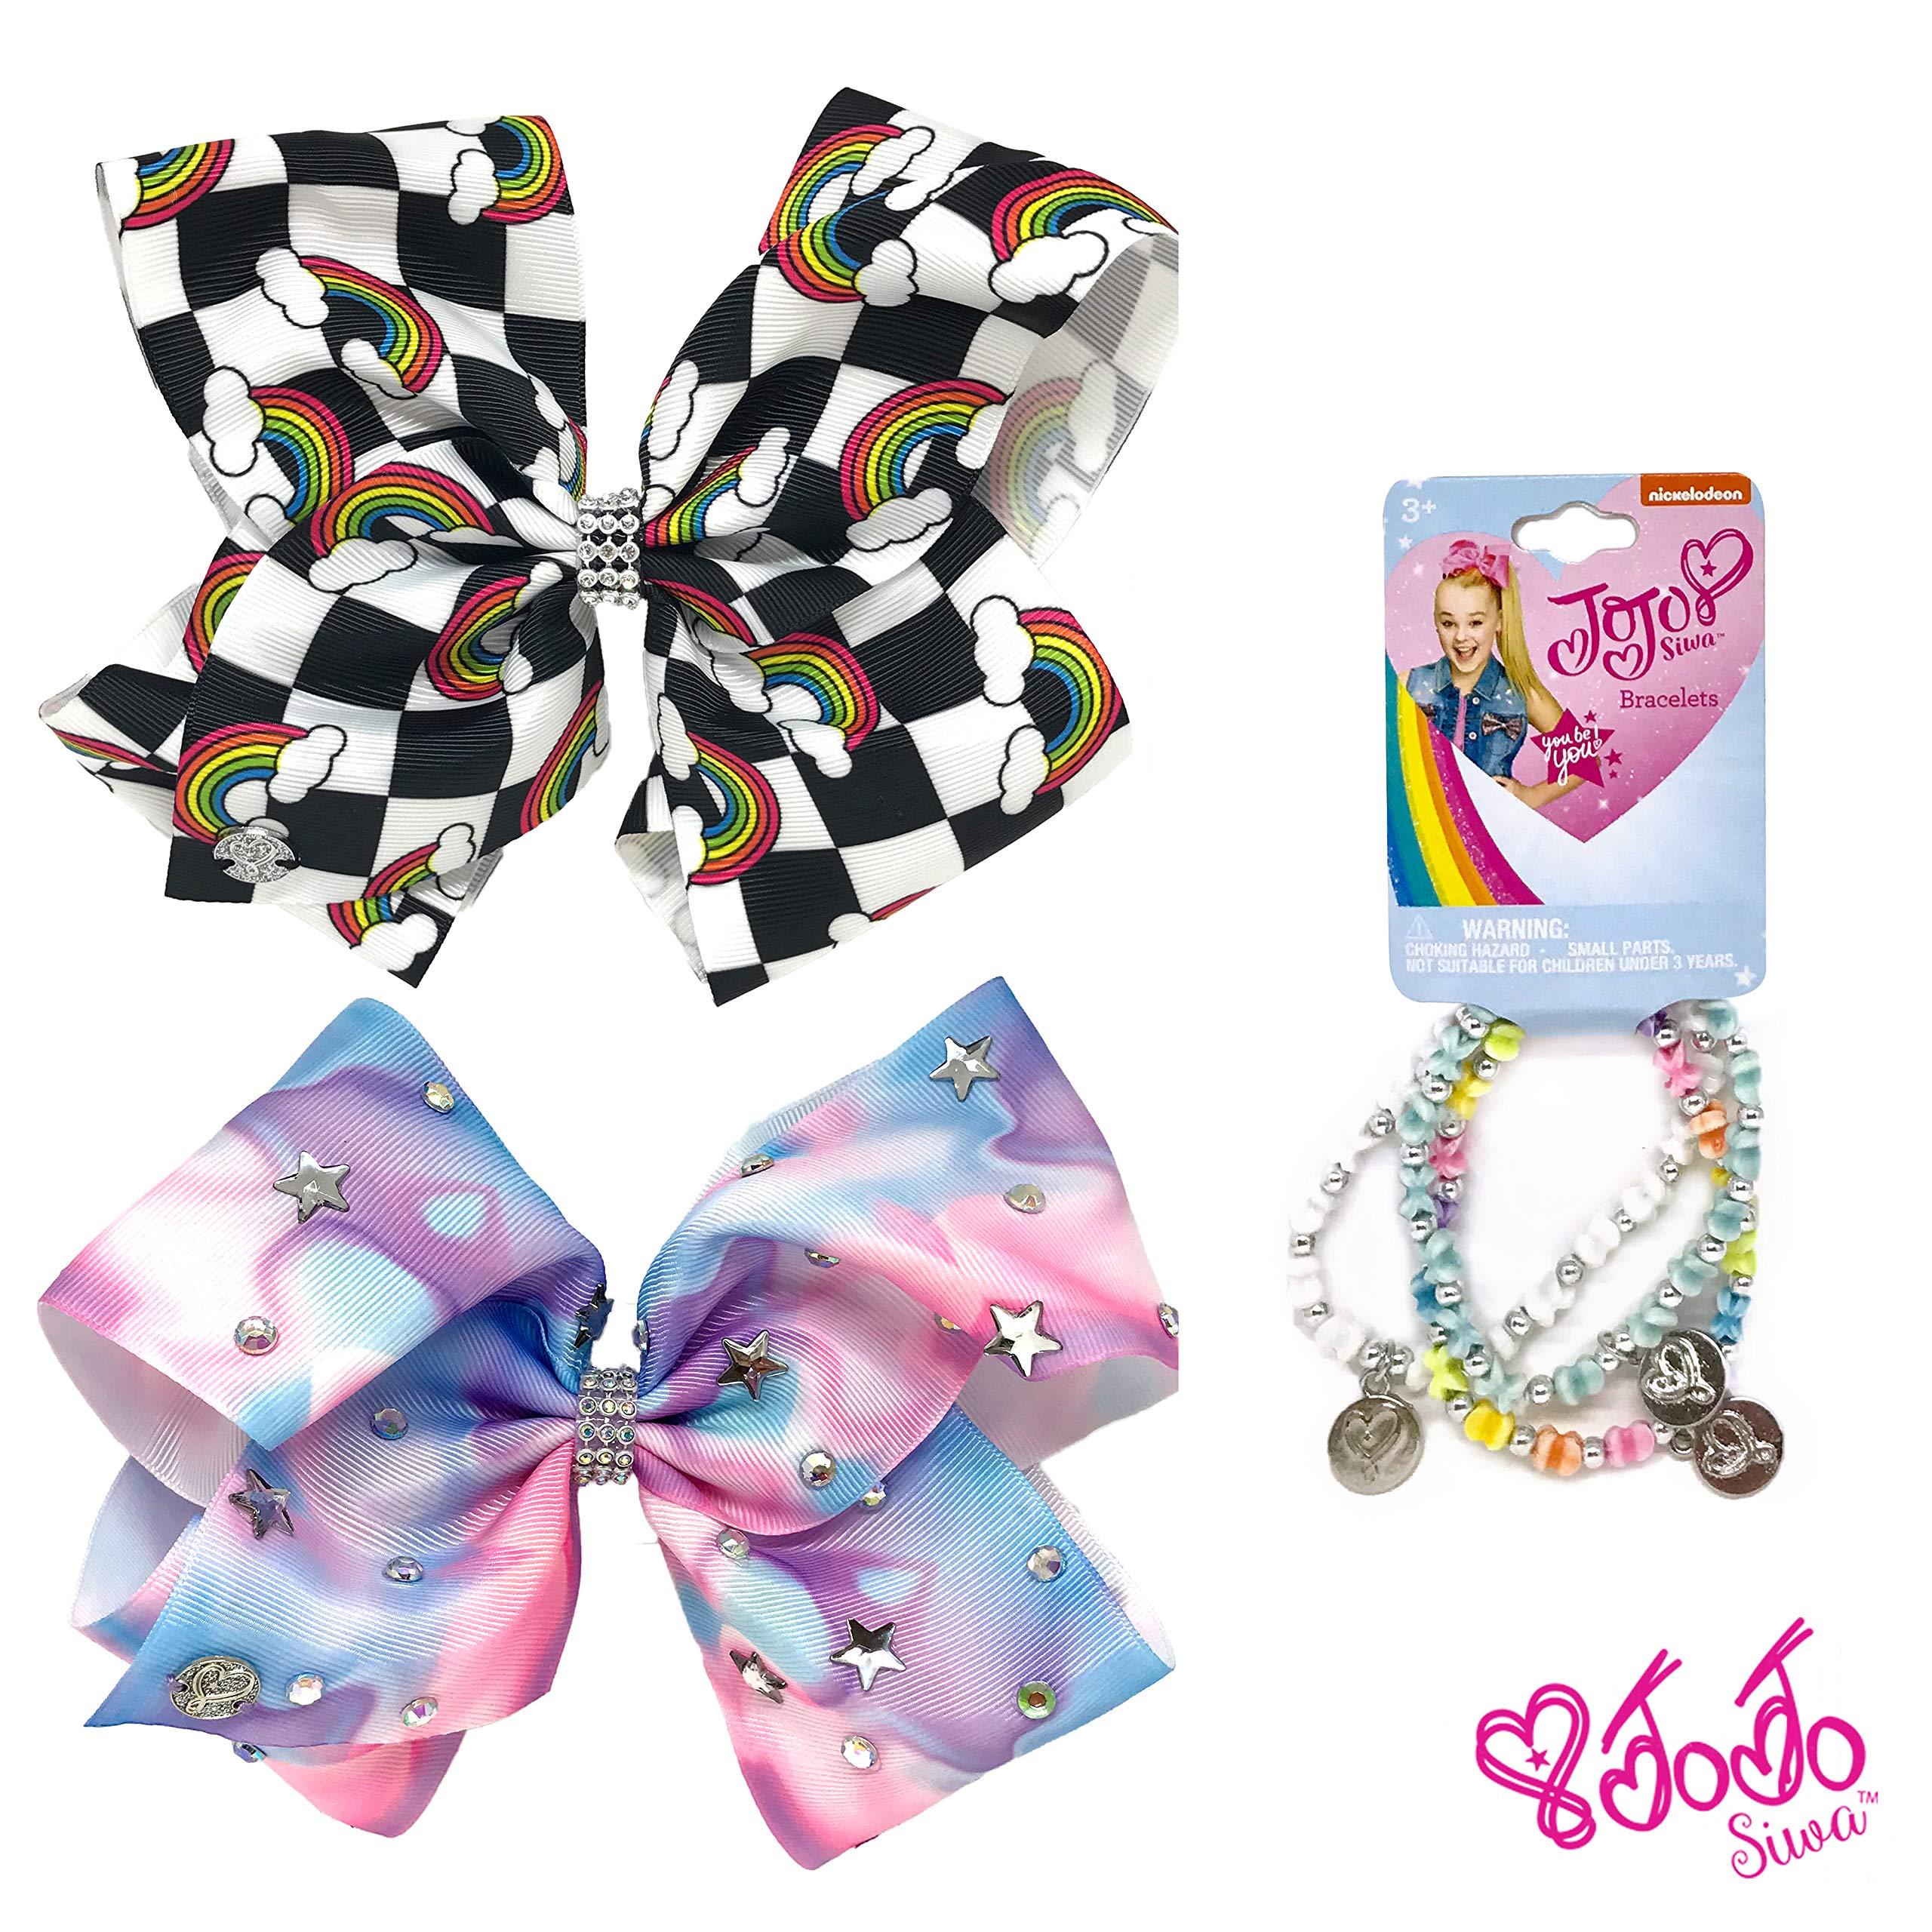 Jojo Siwa Girl's Bow Set 2 Bows and 3 Pack of Bracelets - Checker box with Rainbows, Tye Dye with Stars